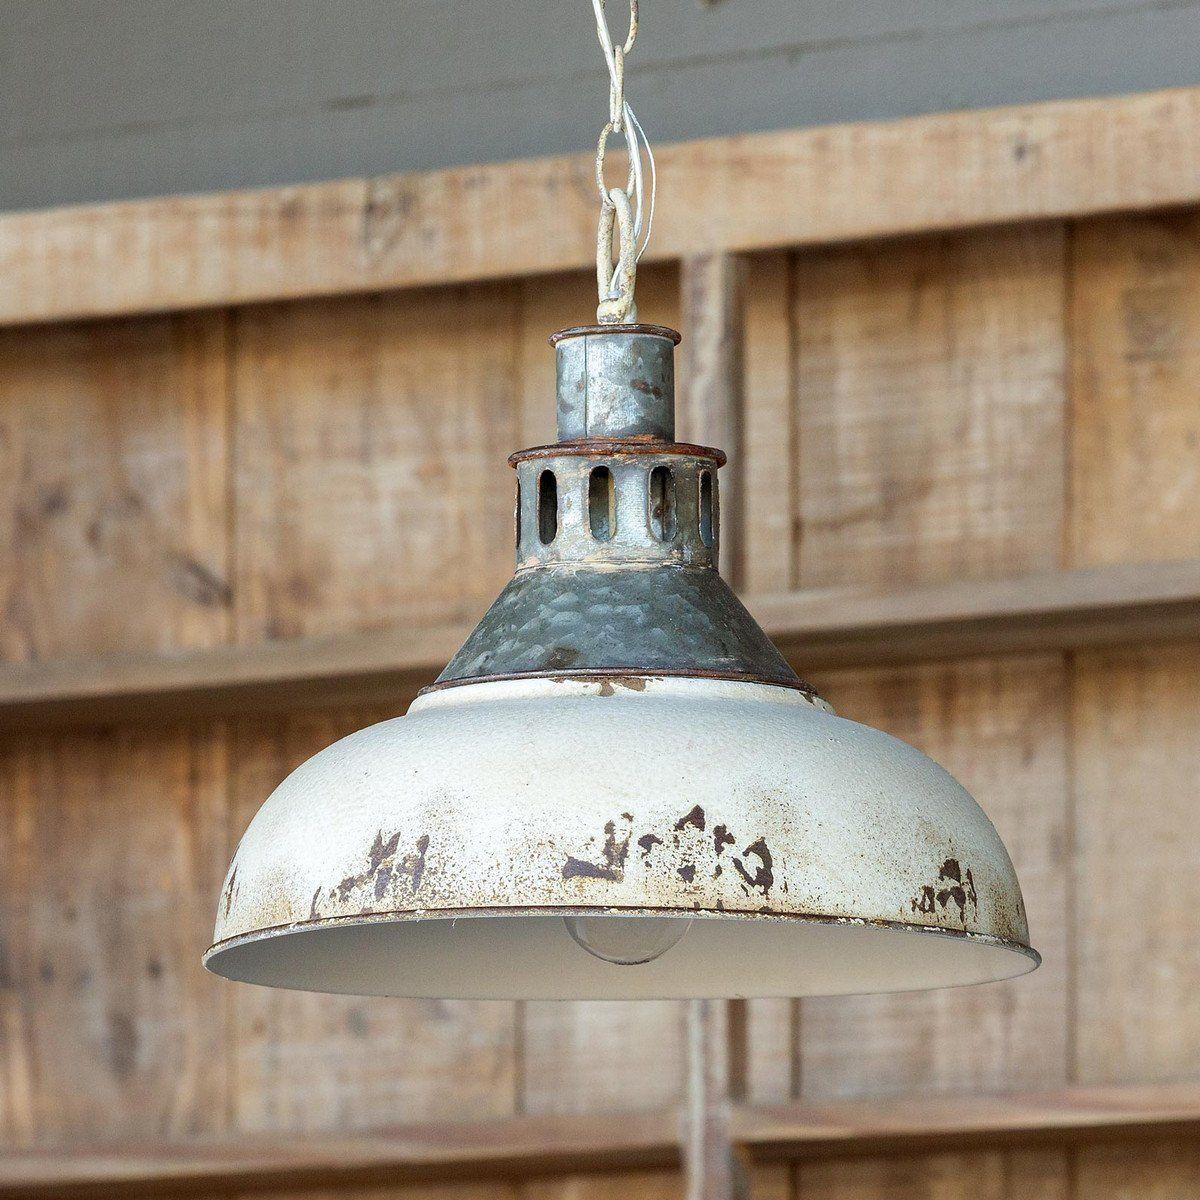 Old Factory Pendant Light Farmhouse Fresh Home Factory Pendant Light Rustic Pendant Lighting Farmhouse Pendant Lighting